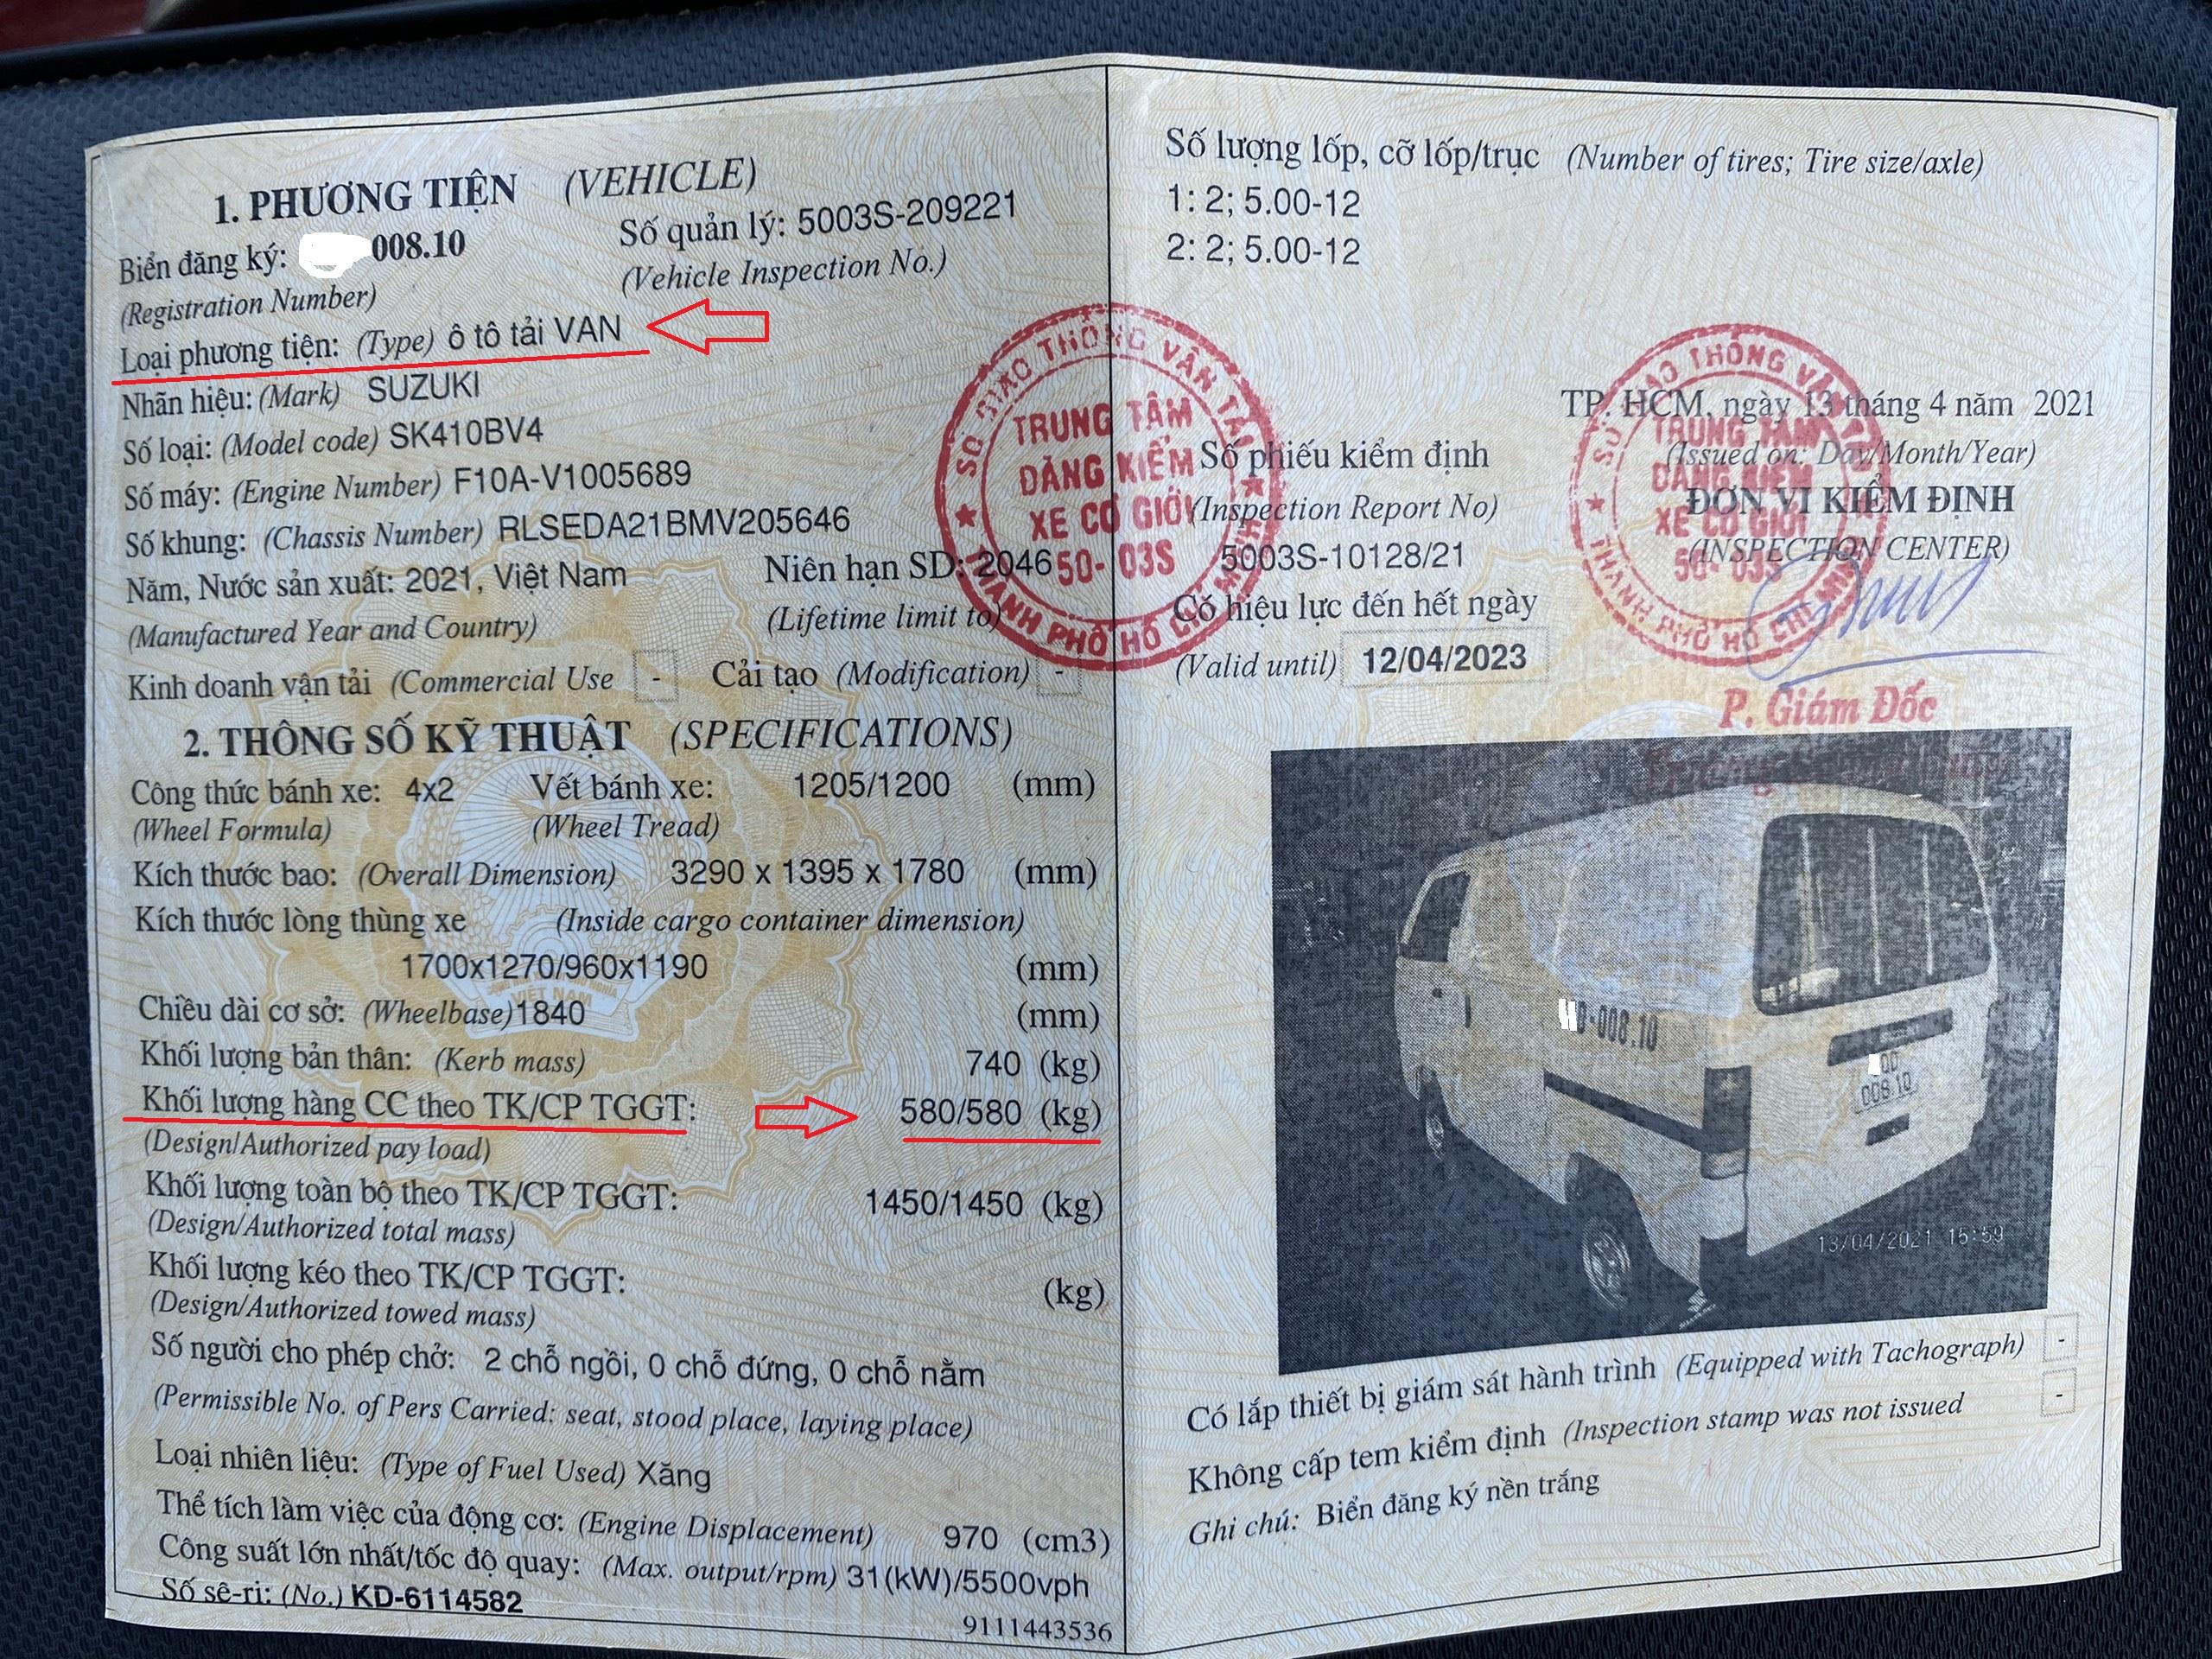 Xe tải Suzuki blind van chạy giờ cấm